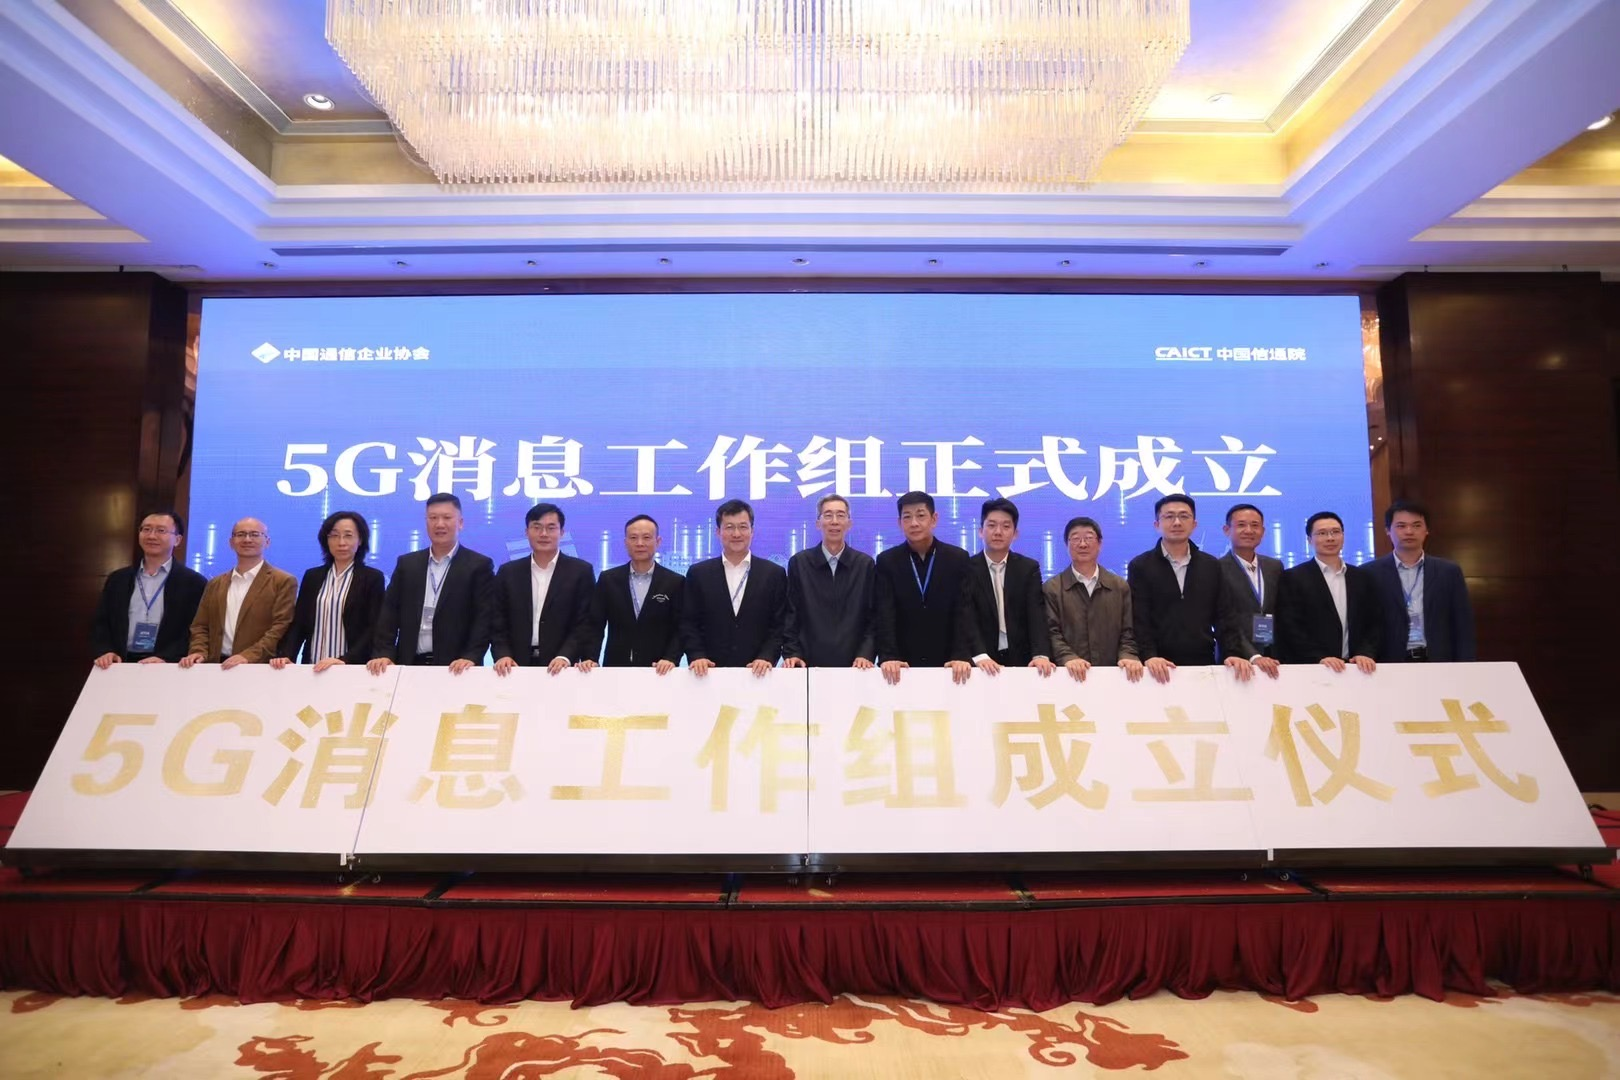 5G消息工作组于3月30日正式成立!